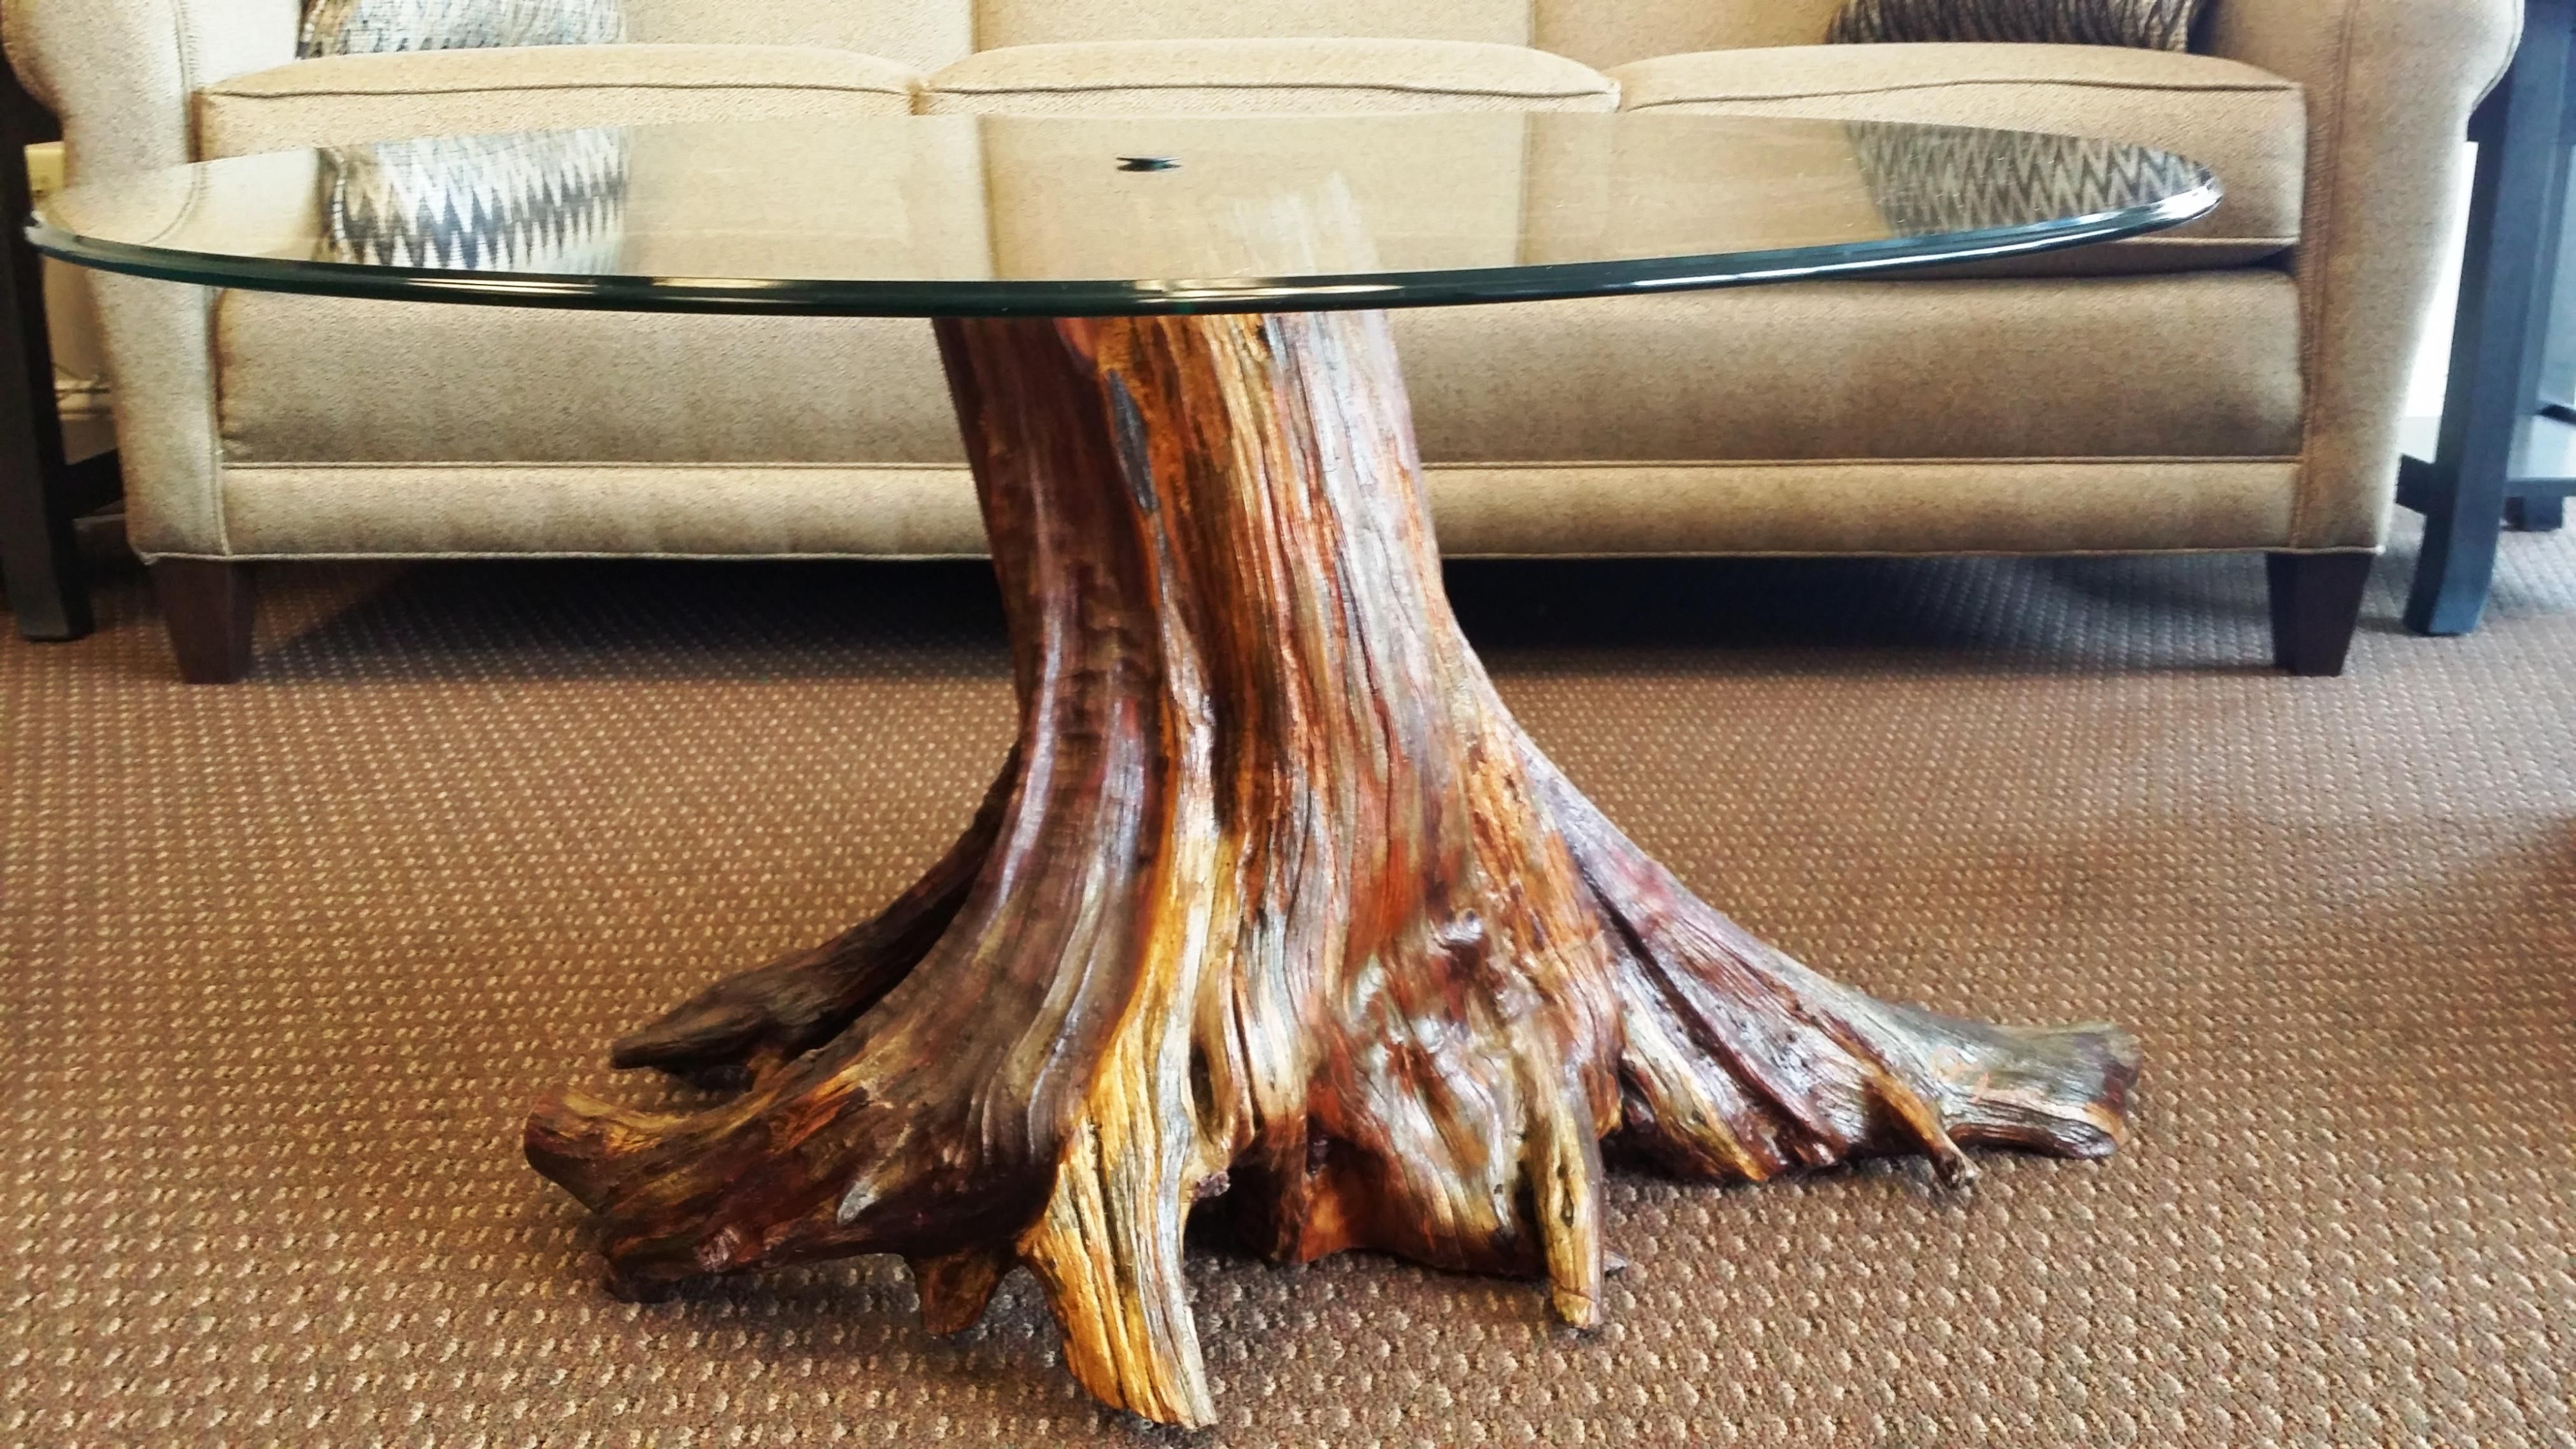 Tree Trunk Coffee Table With Glass Top Moveis De Madeira Rustica Raizes De Arvores Decoracao De Casa Rustica [ 2276 x 4045 Pixel ]